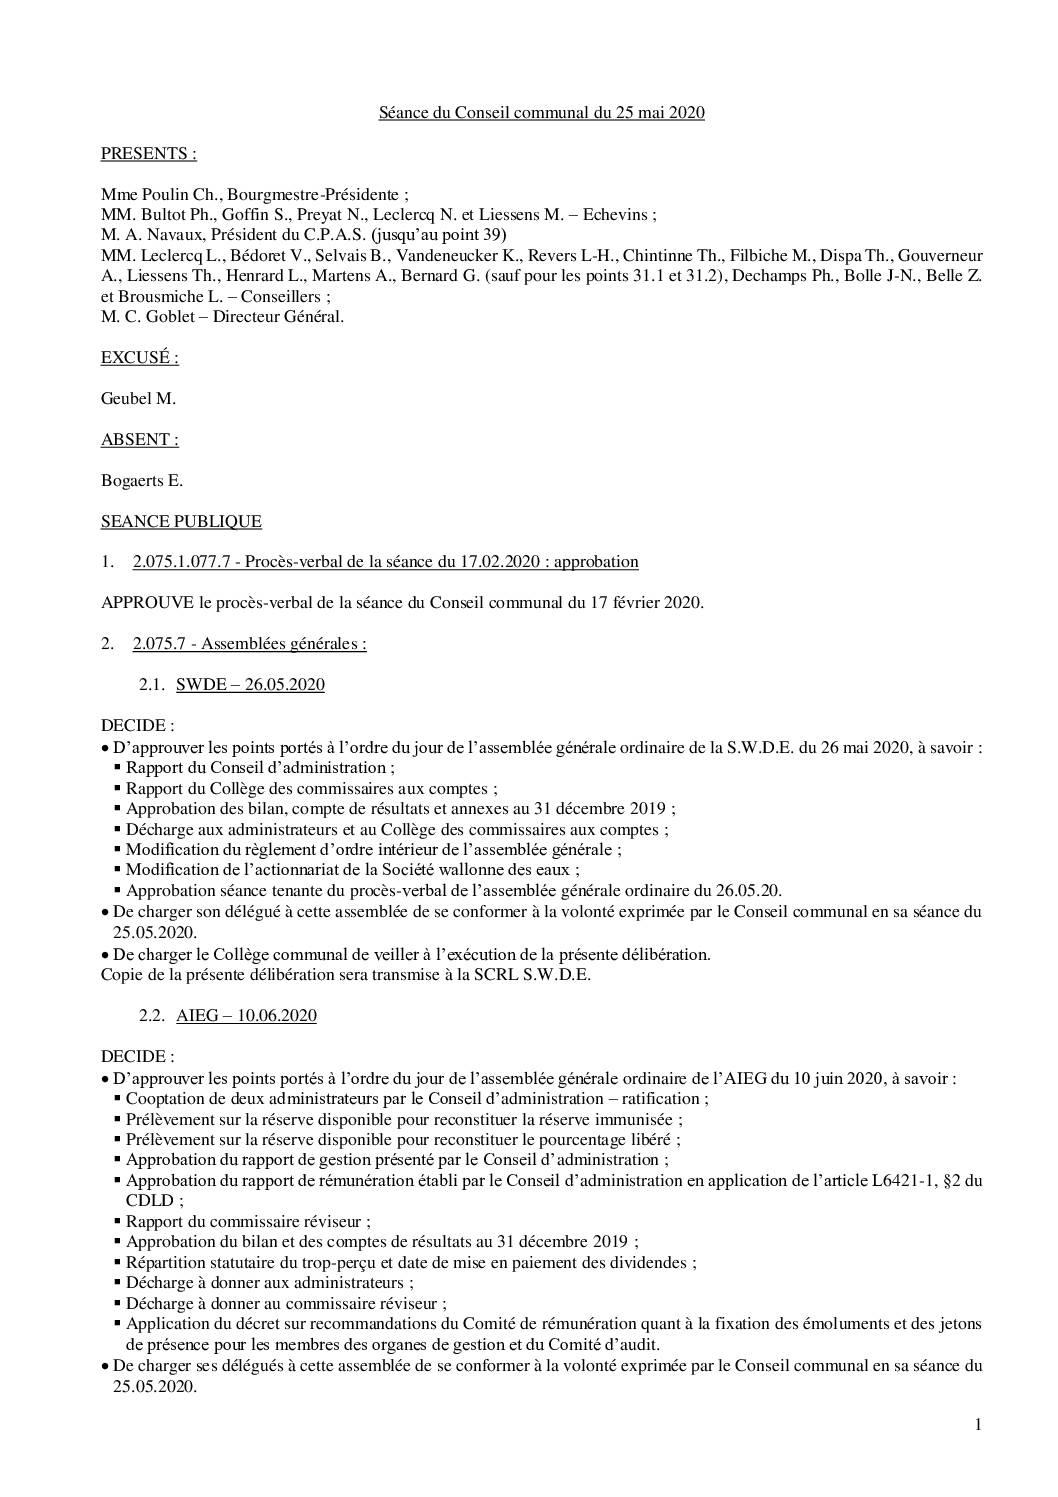 Conseil communal – 25 mai 2020